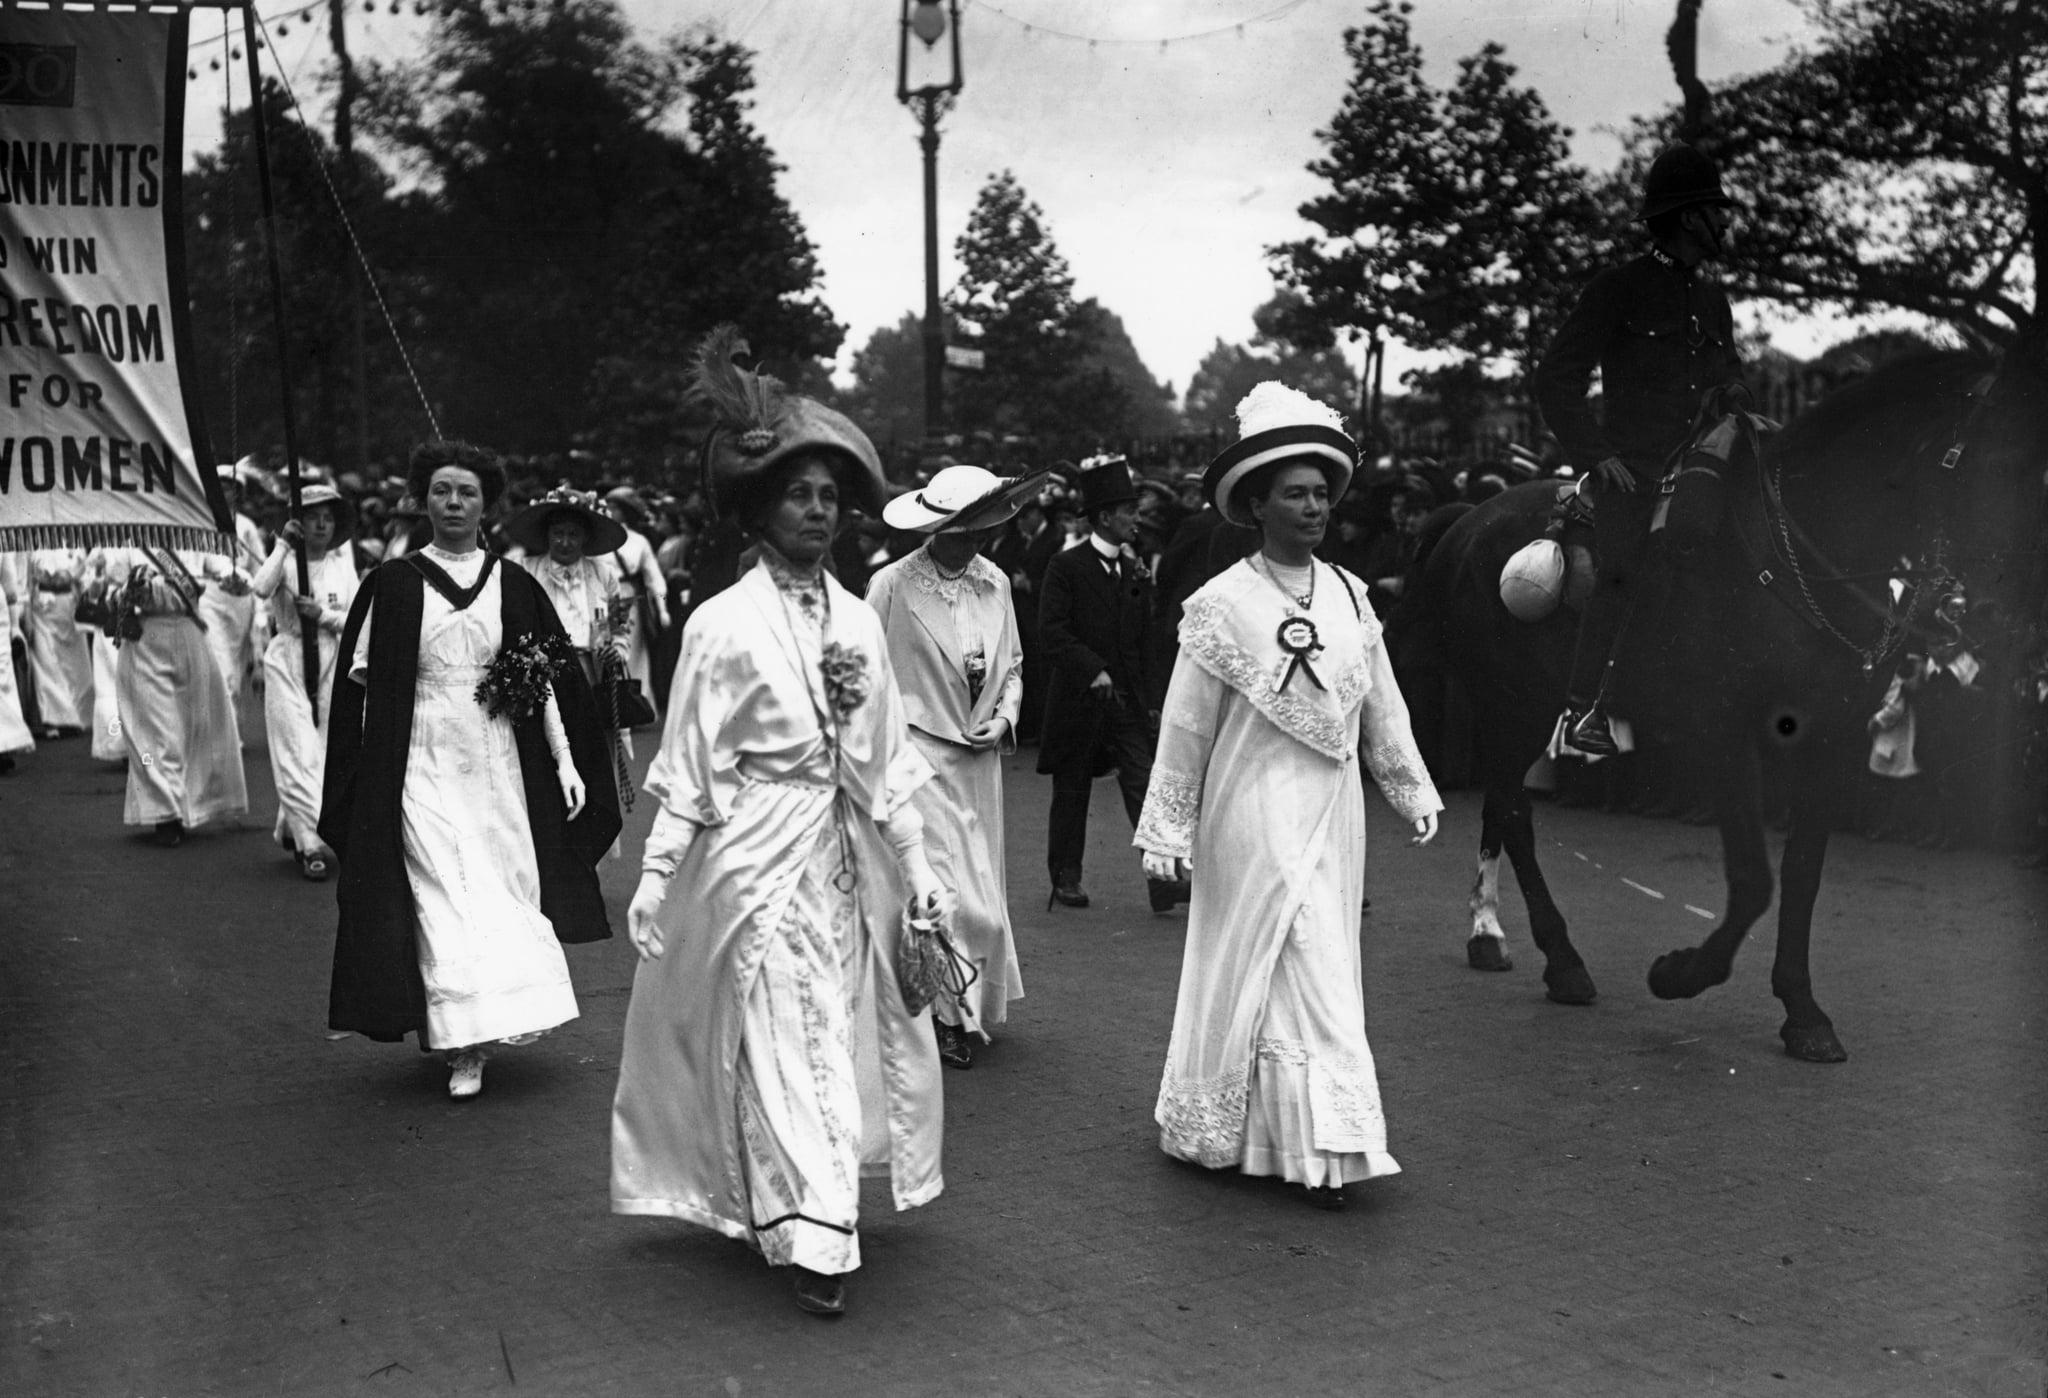 19th June 1911:  Emmeline Pankhurst (front left) leads a suffragette parade through London